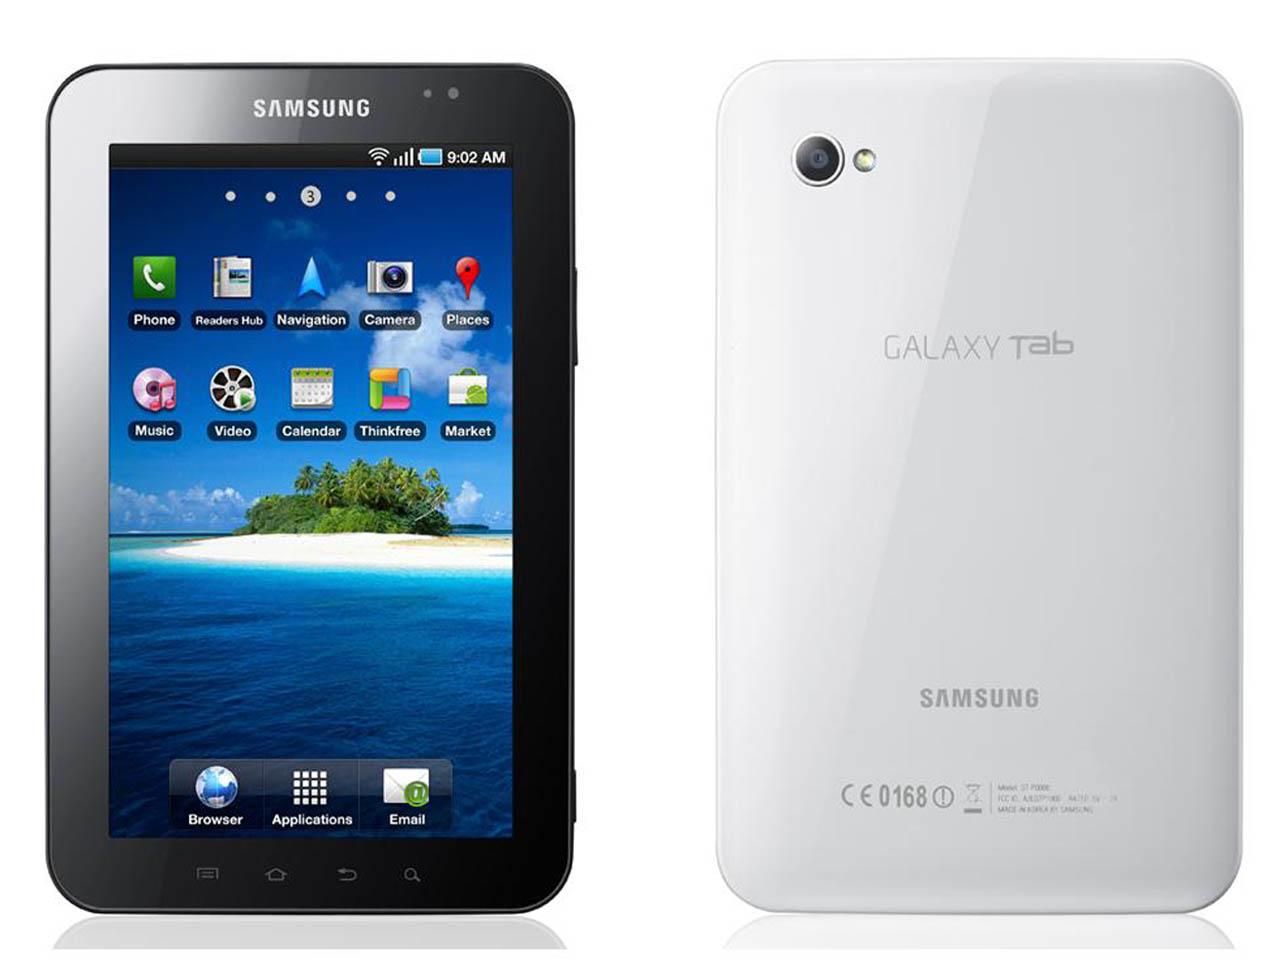 http://3.bp.blogspot.com/-zmMJkaRSLBE/T50klmuhi8I/AAAAAAAAAF0/iV2n5fQ1TtE/s1600/Samsung-P1000-Galaxy-Tab-wallpaper(mobtips.blogsport.com).jpg